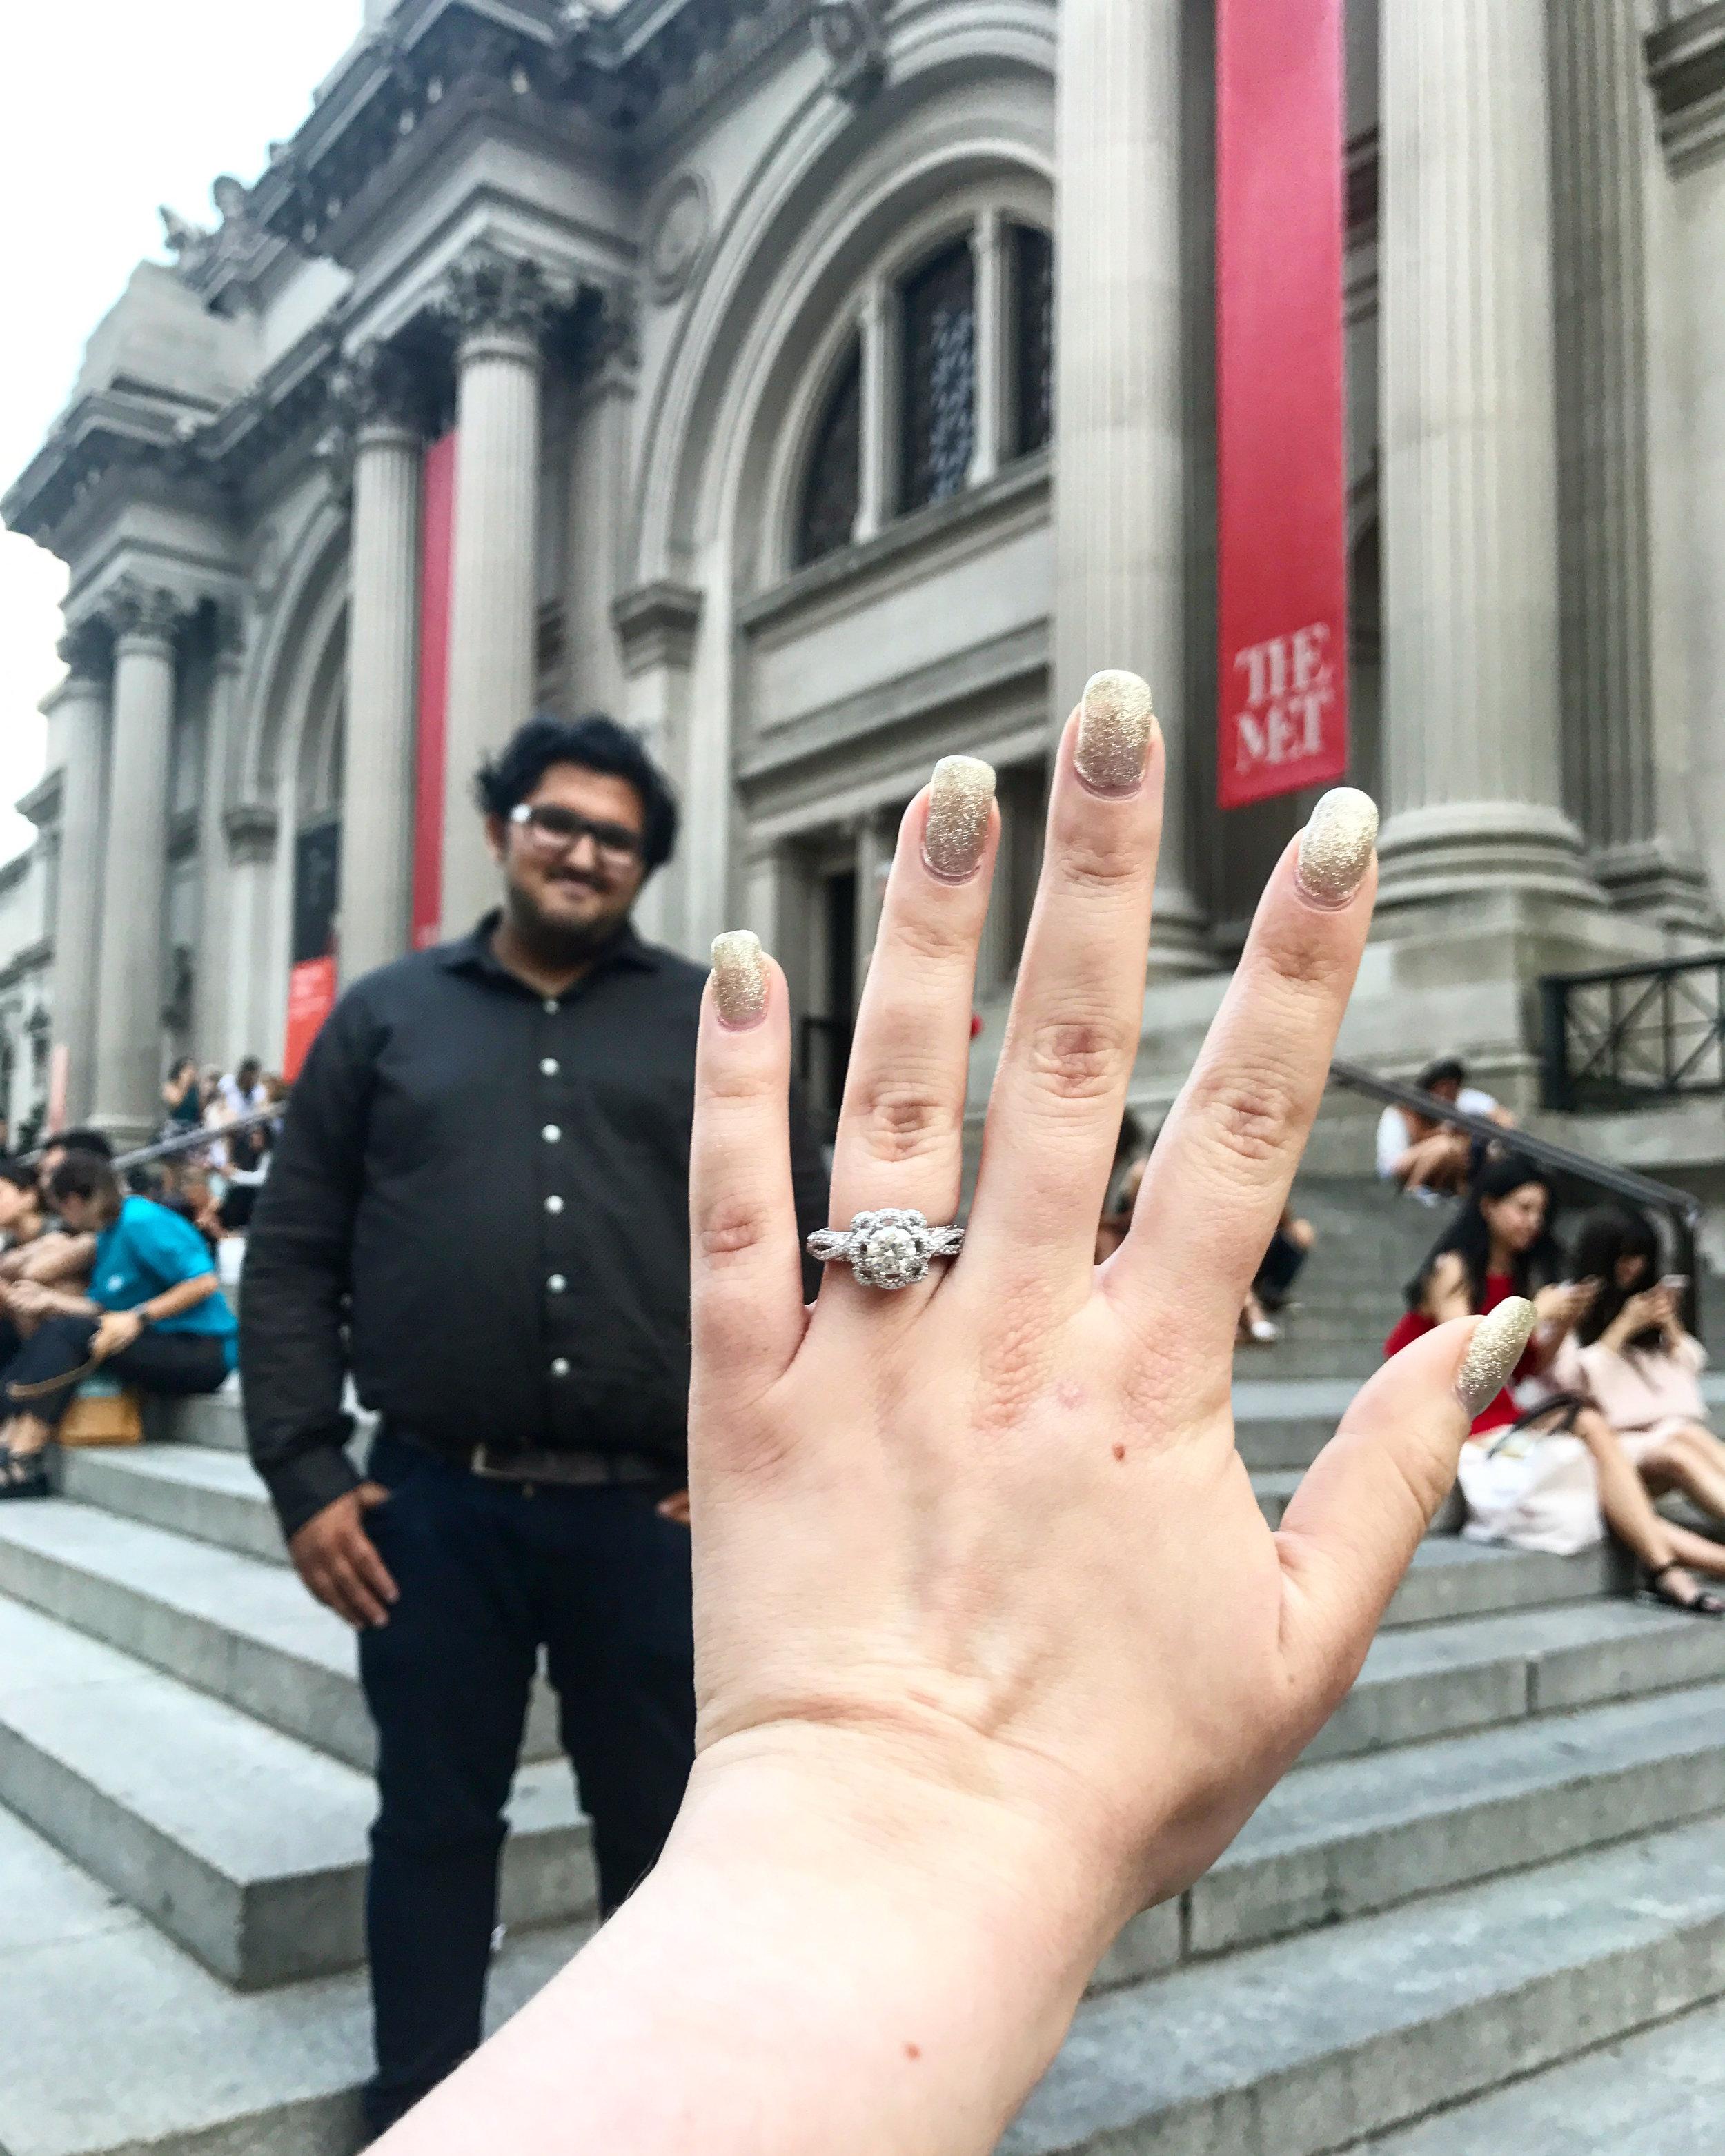 New York City The Met Proposal